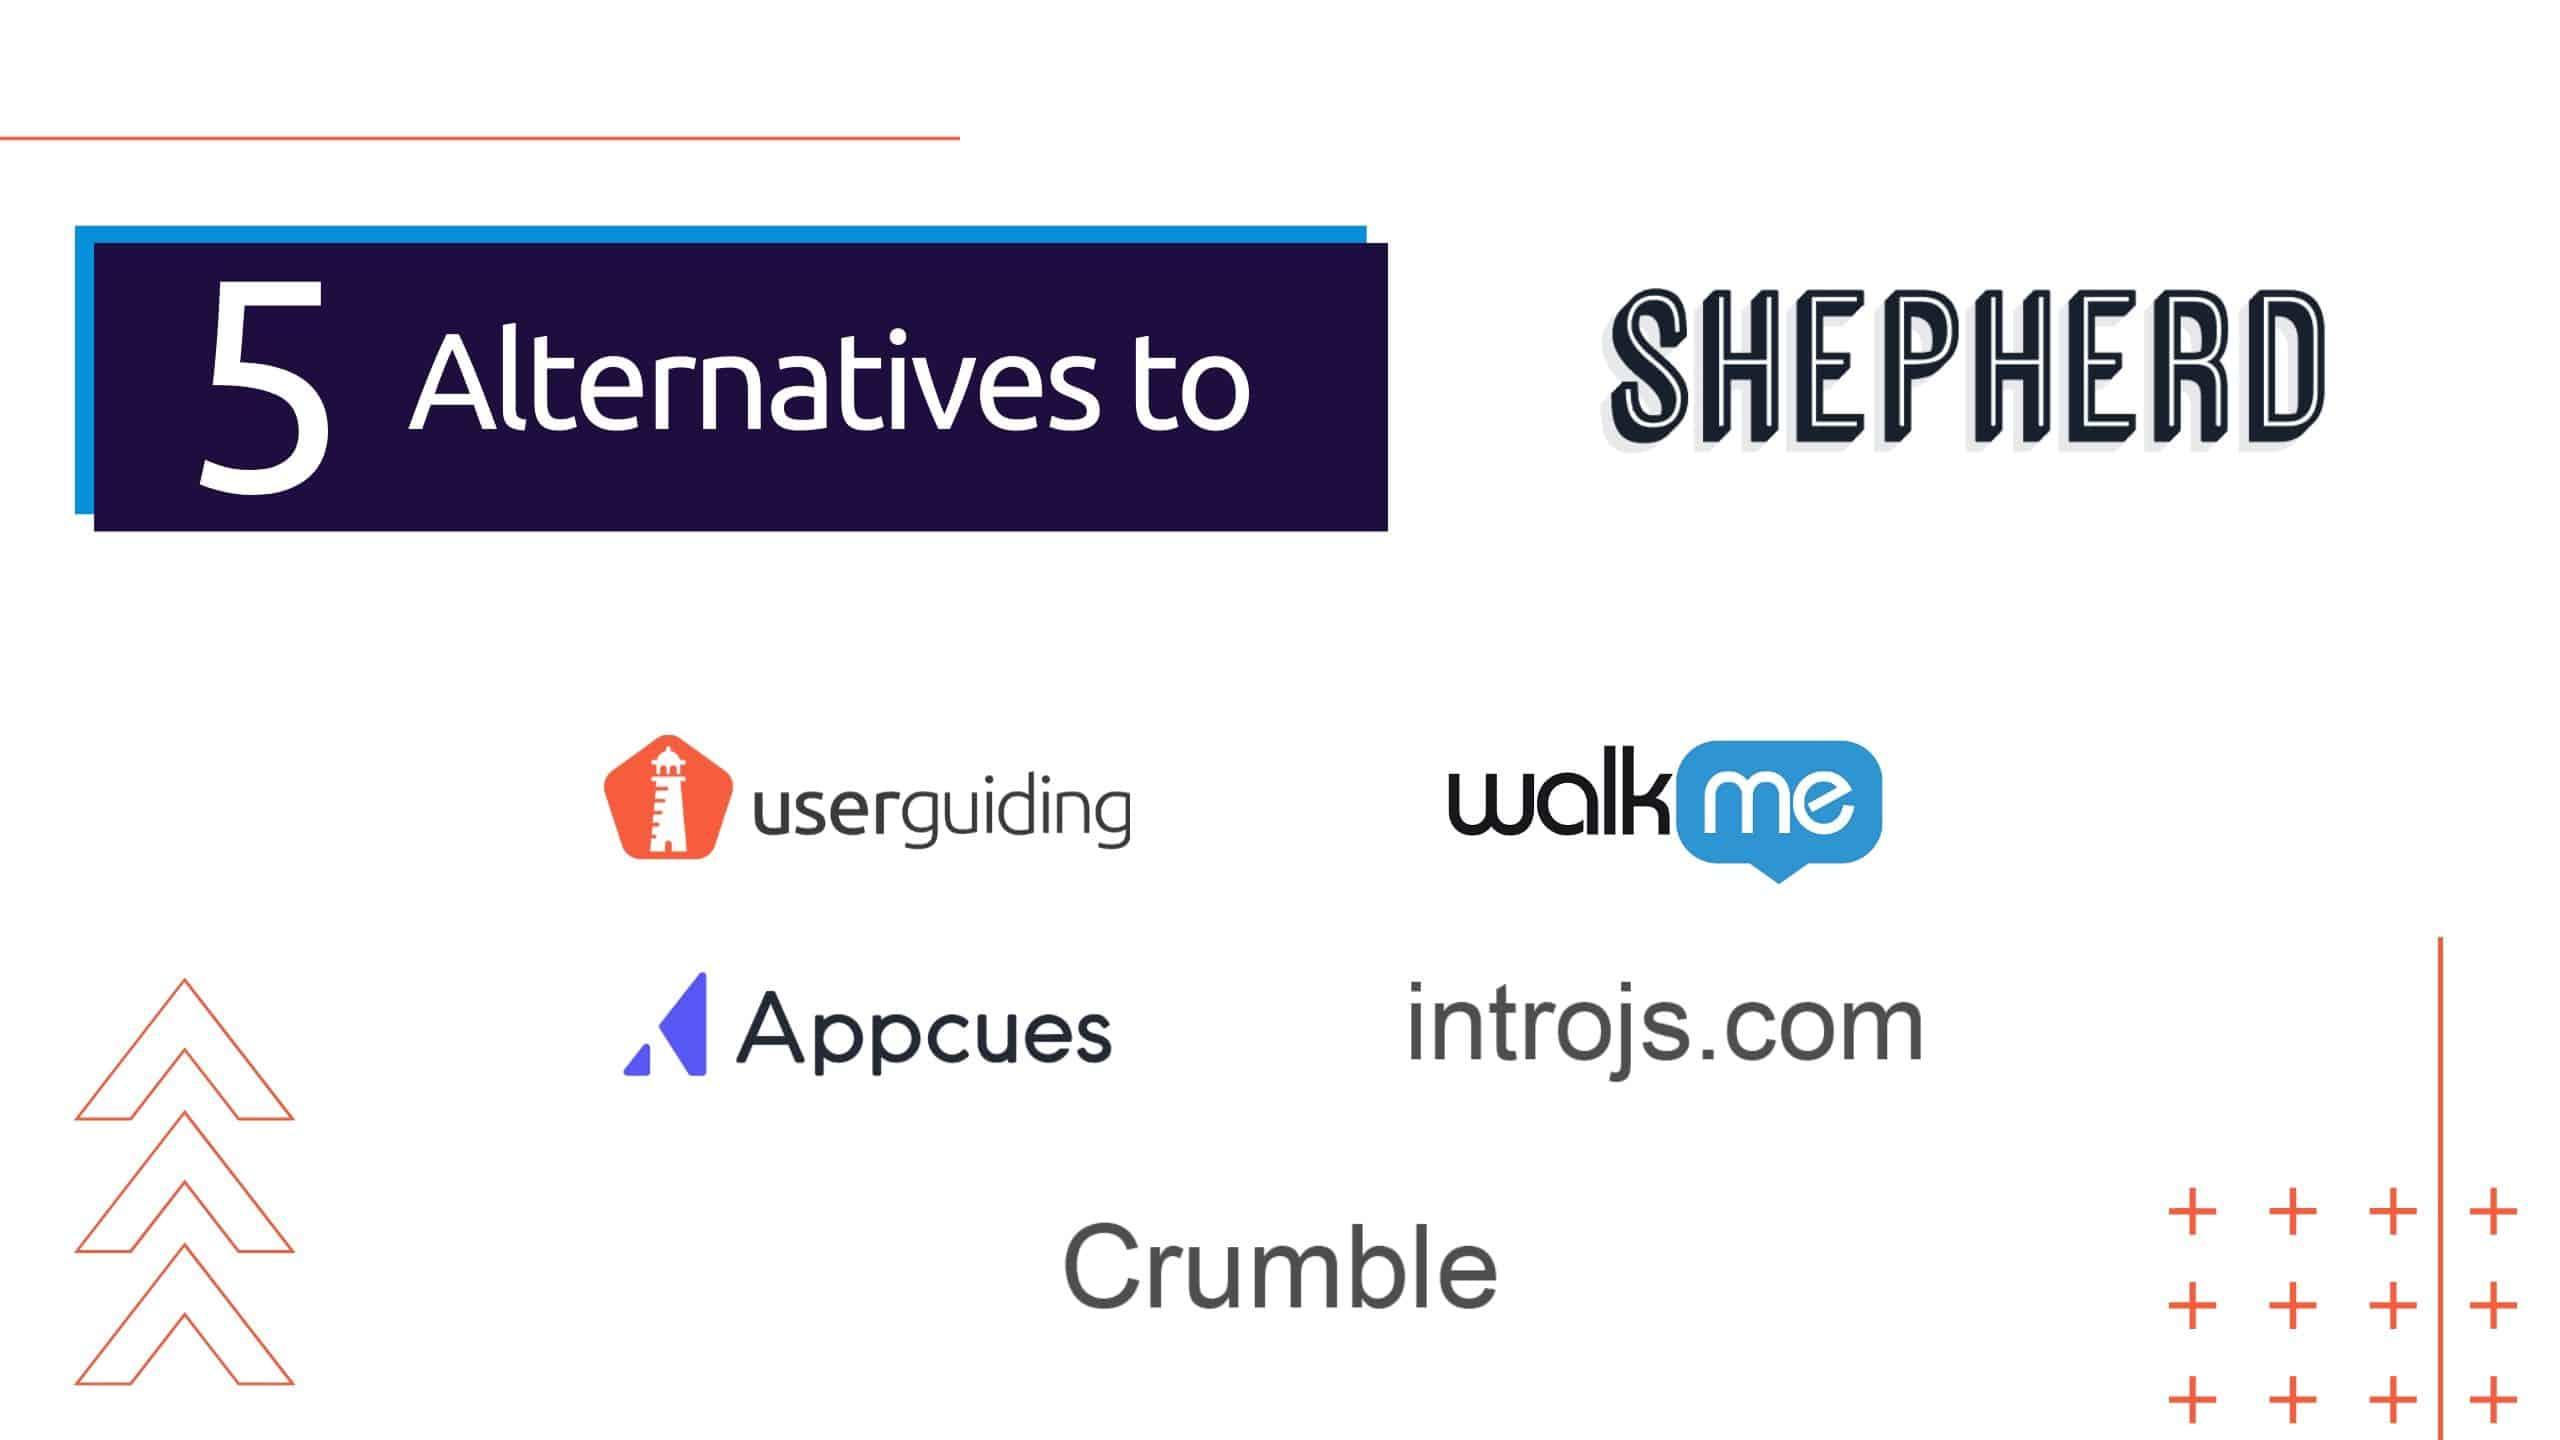 shepherd alternatives